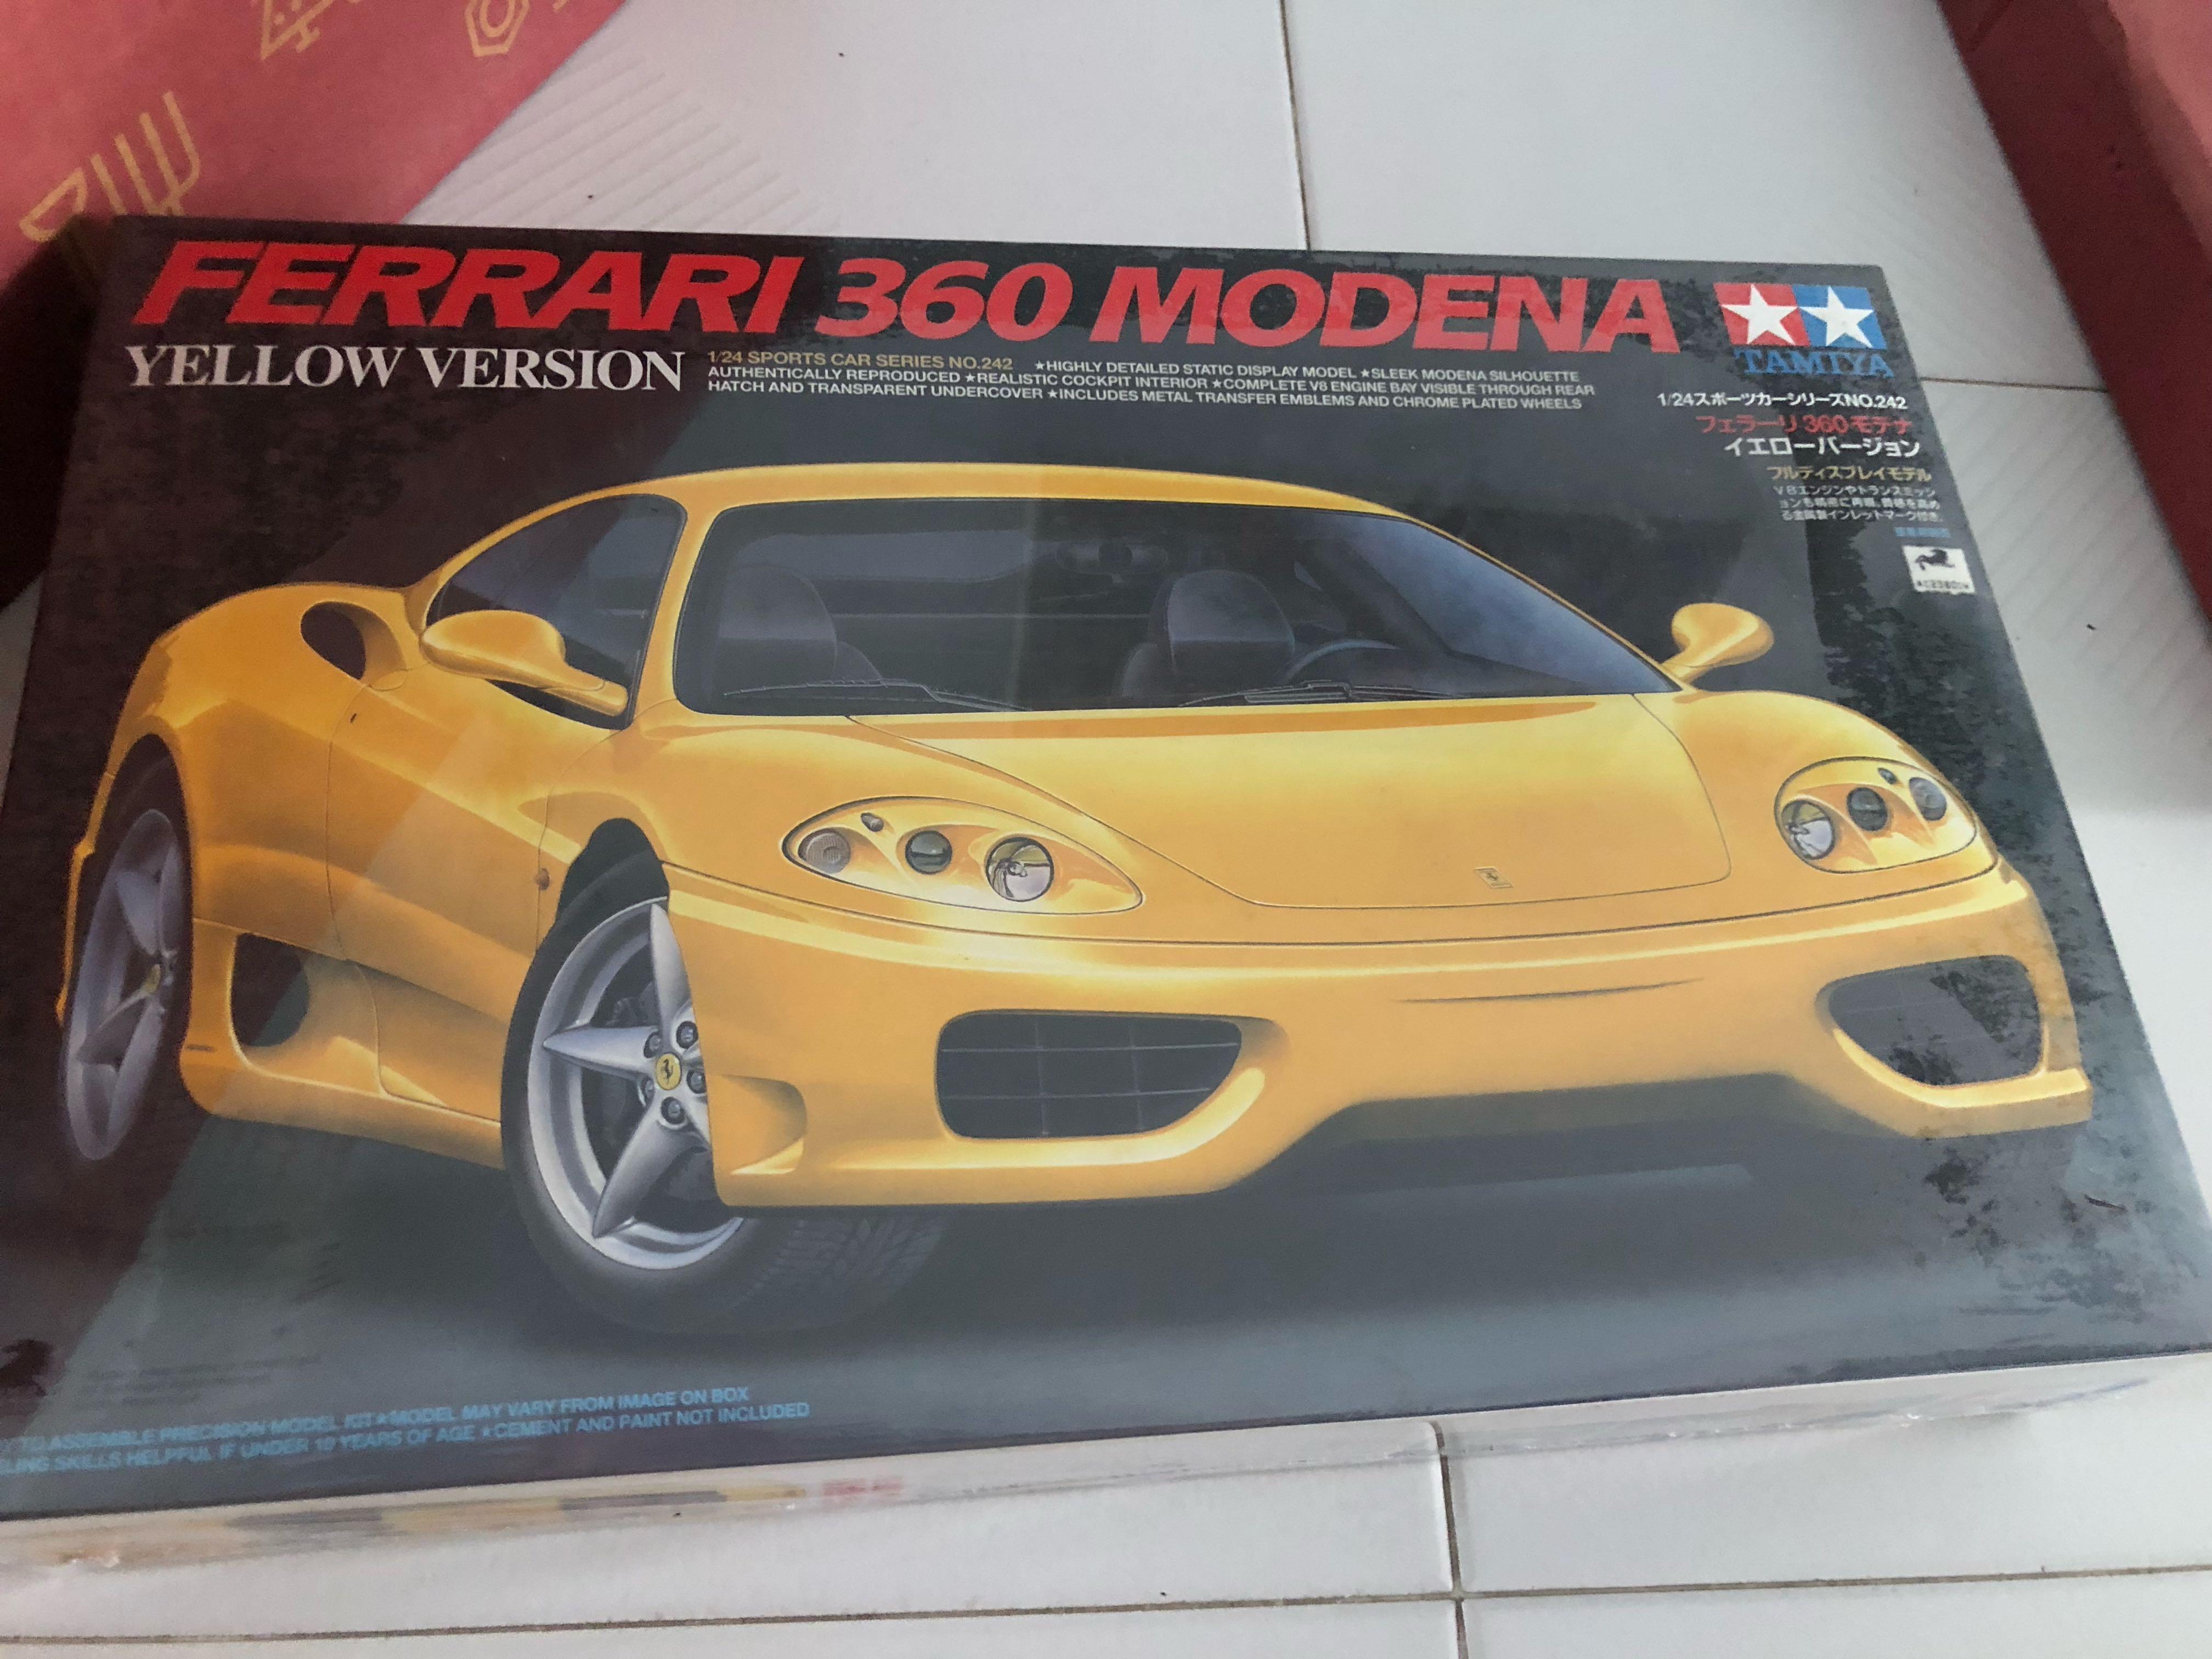 1 24 Tamiya Ferrari 360 Modena Toys Games Others On Carousell